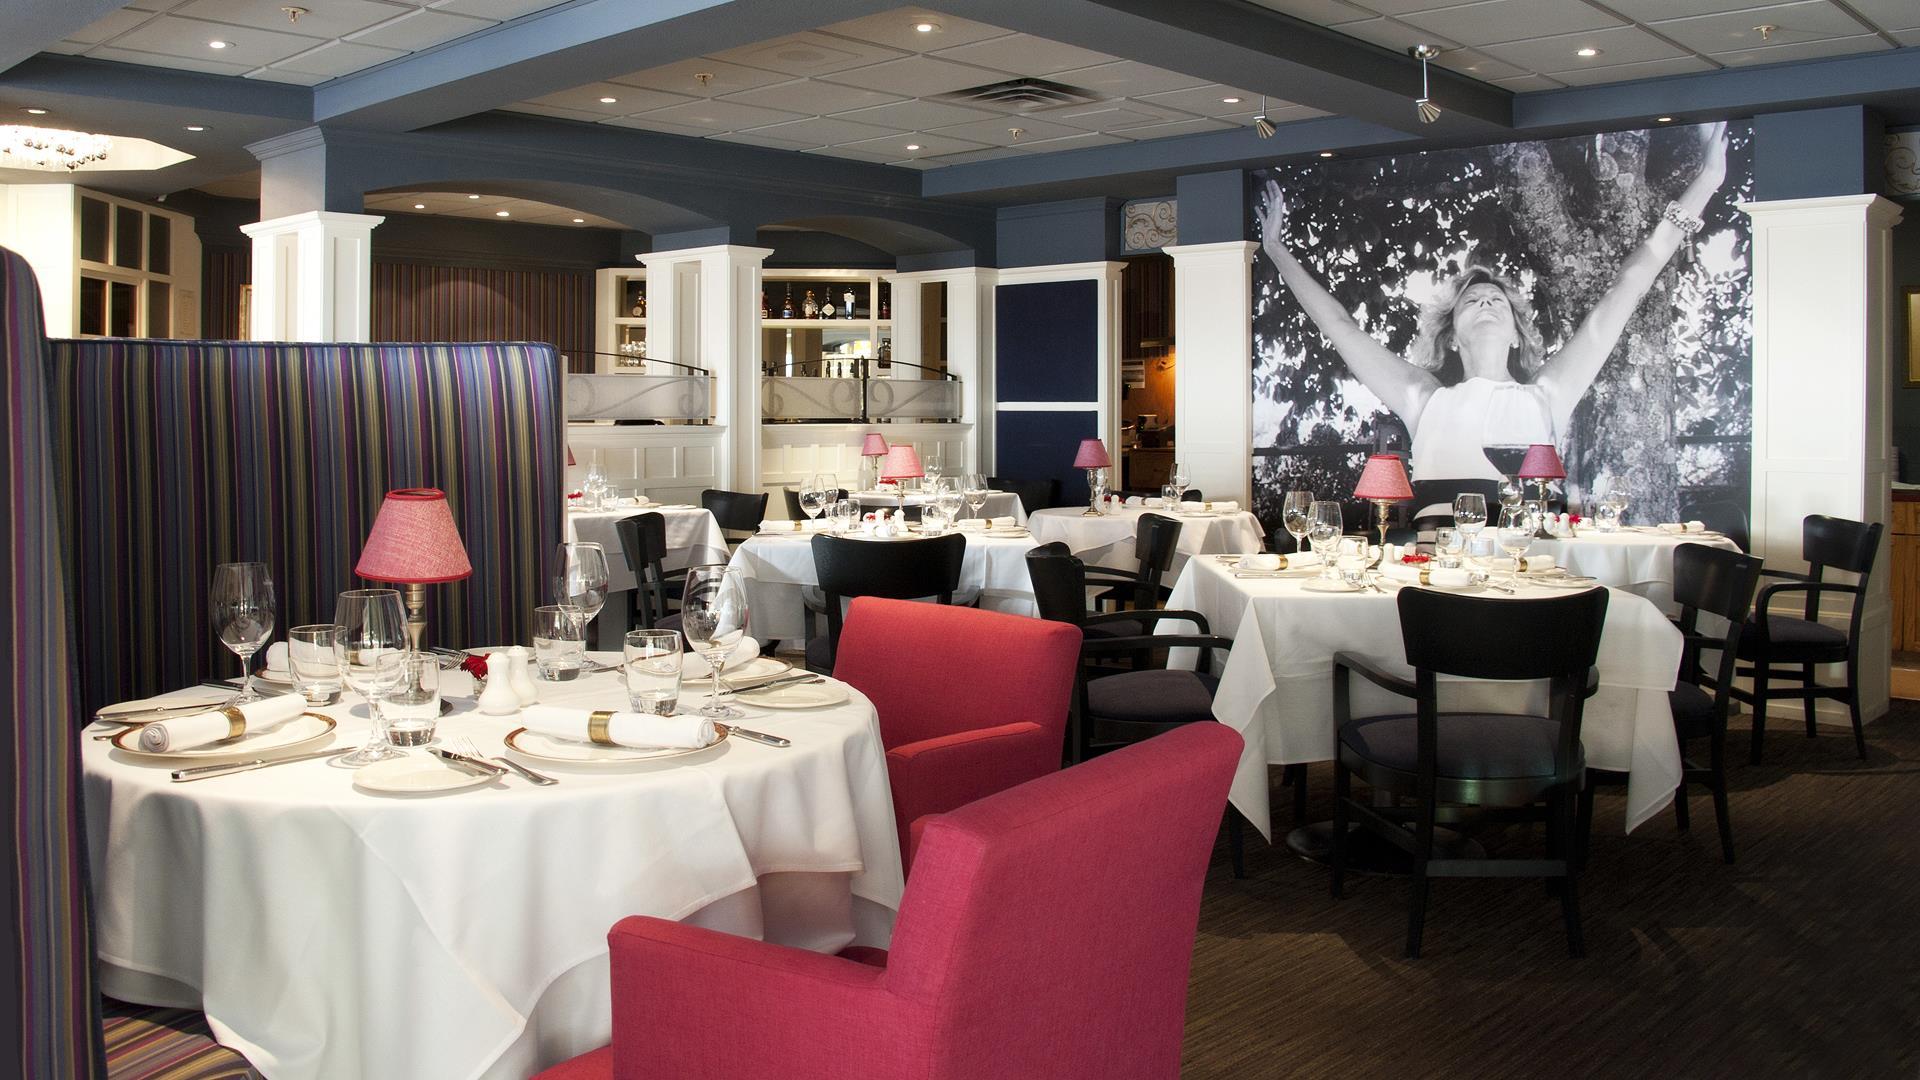 Best Western Premier Hotel Aristocrate à Quebec: Dining Room